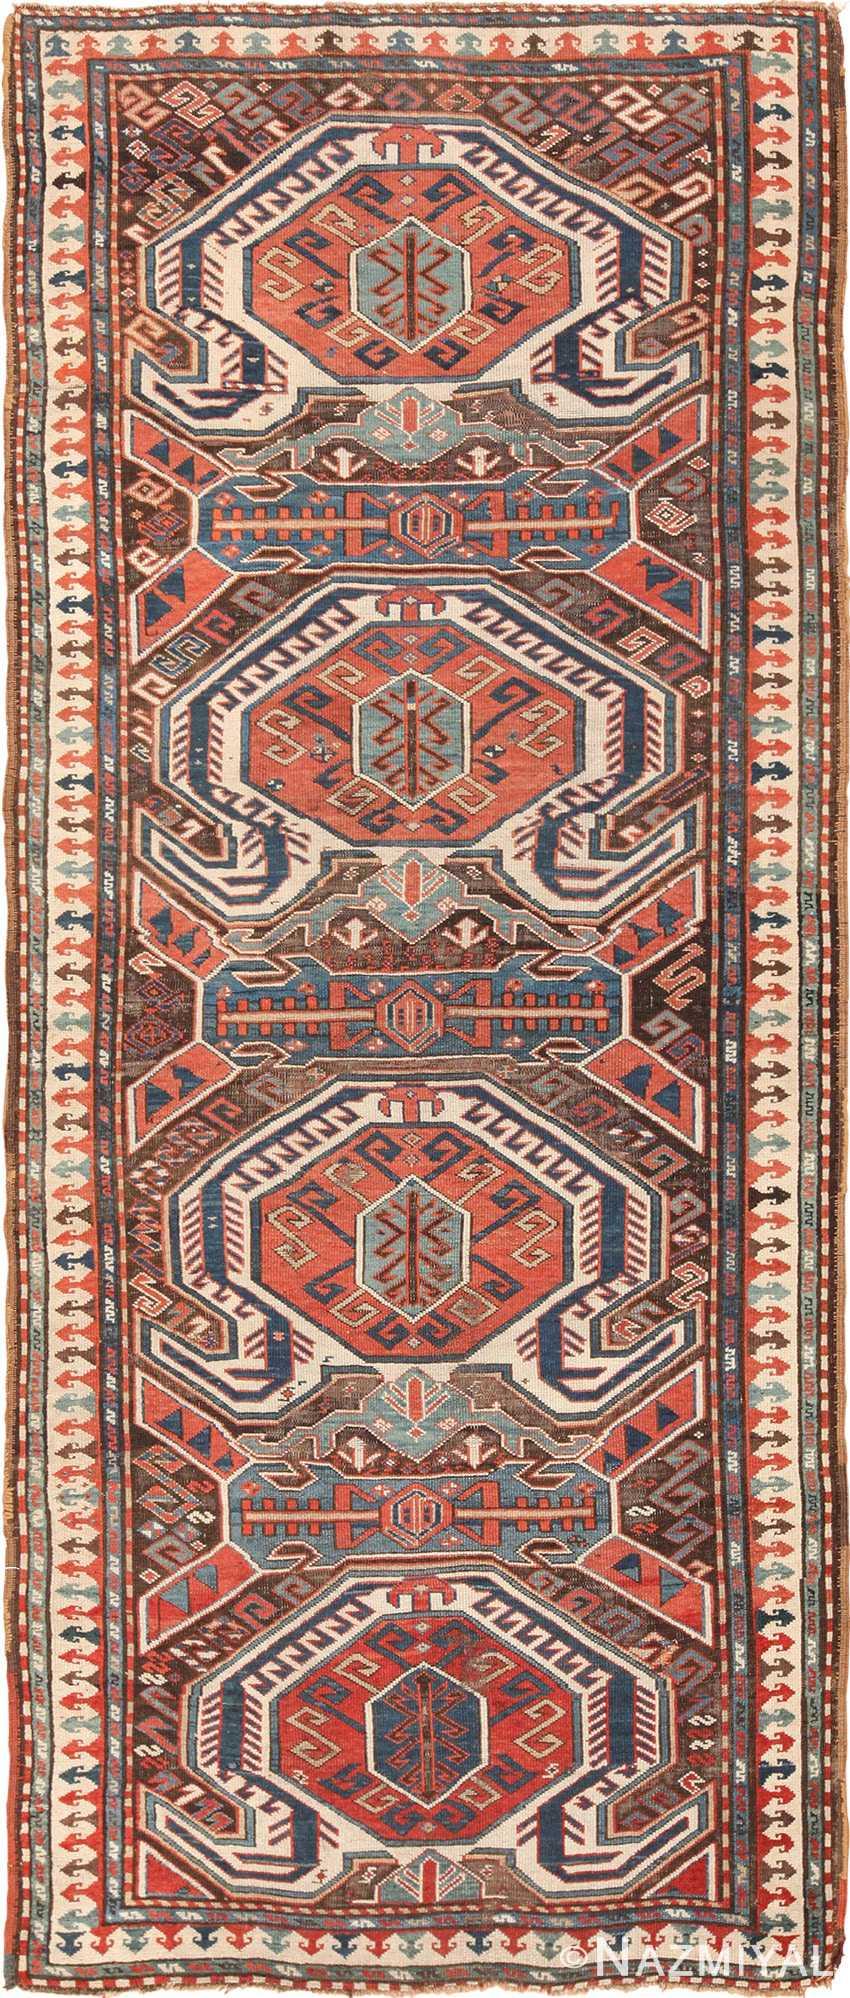 Long And Narrow Antique Caucasian Turtle Kazak Rug 49644 Nazmiyal Rugs